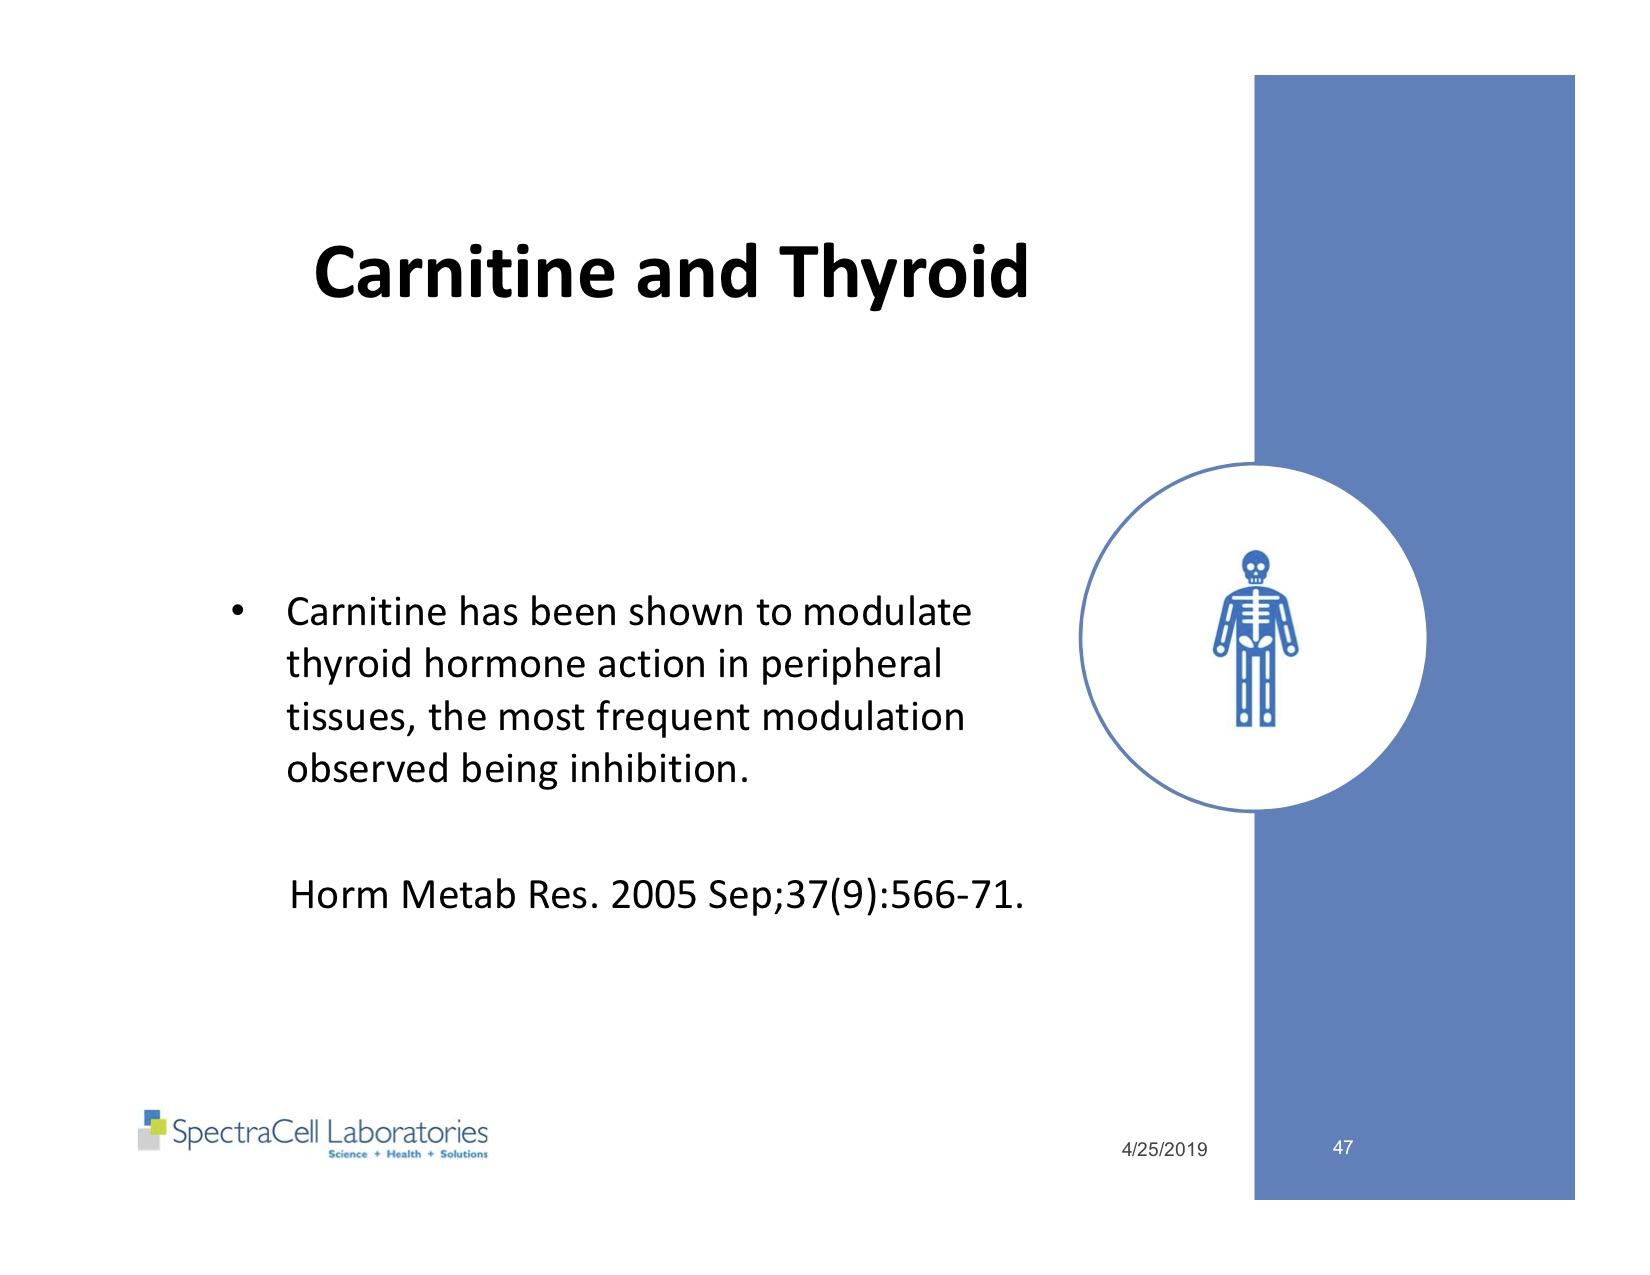 Autism and Thyroid slides 47.jpg